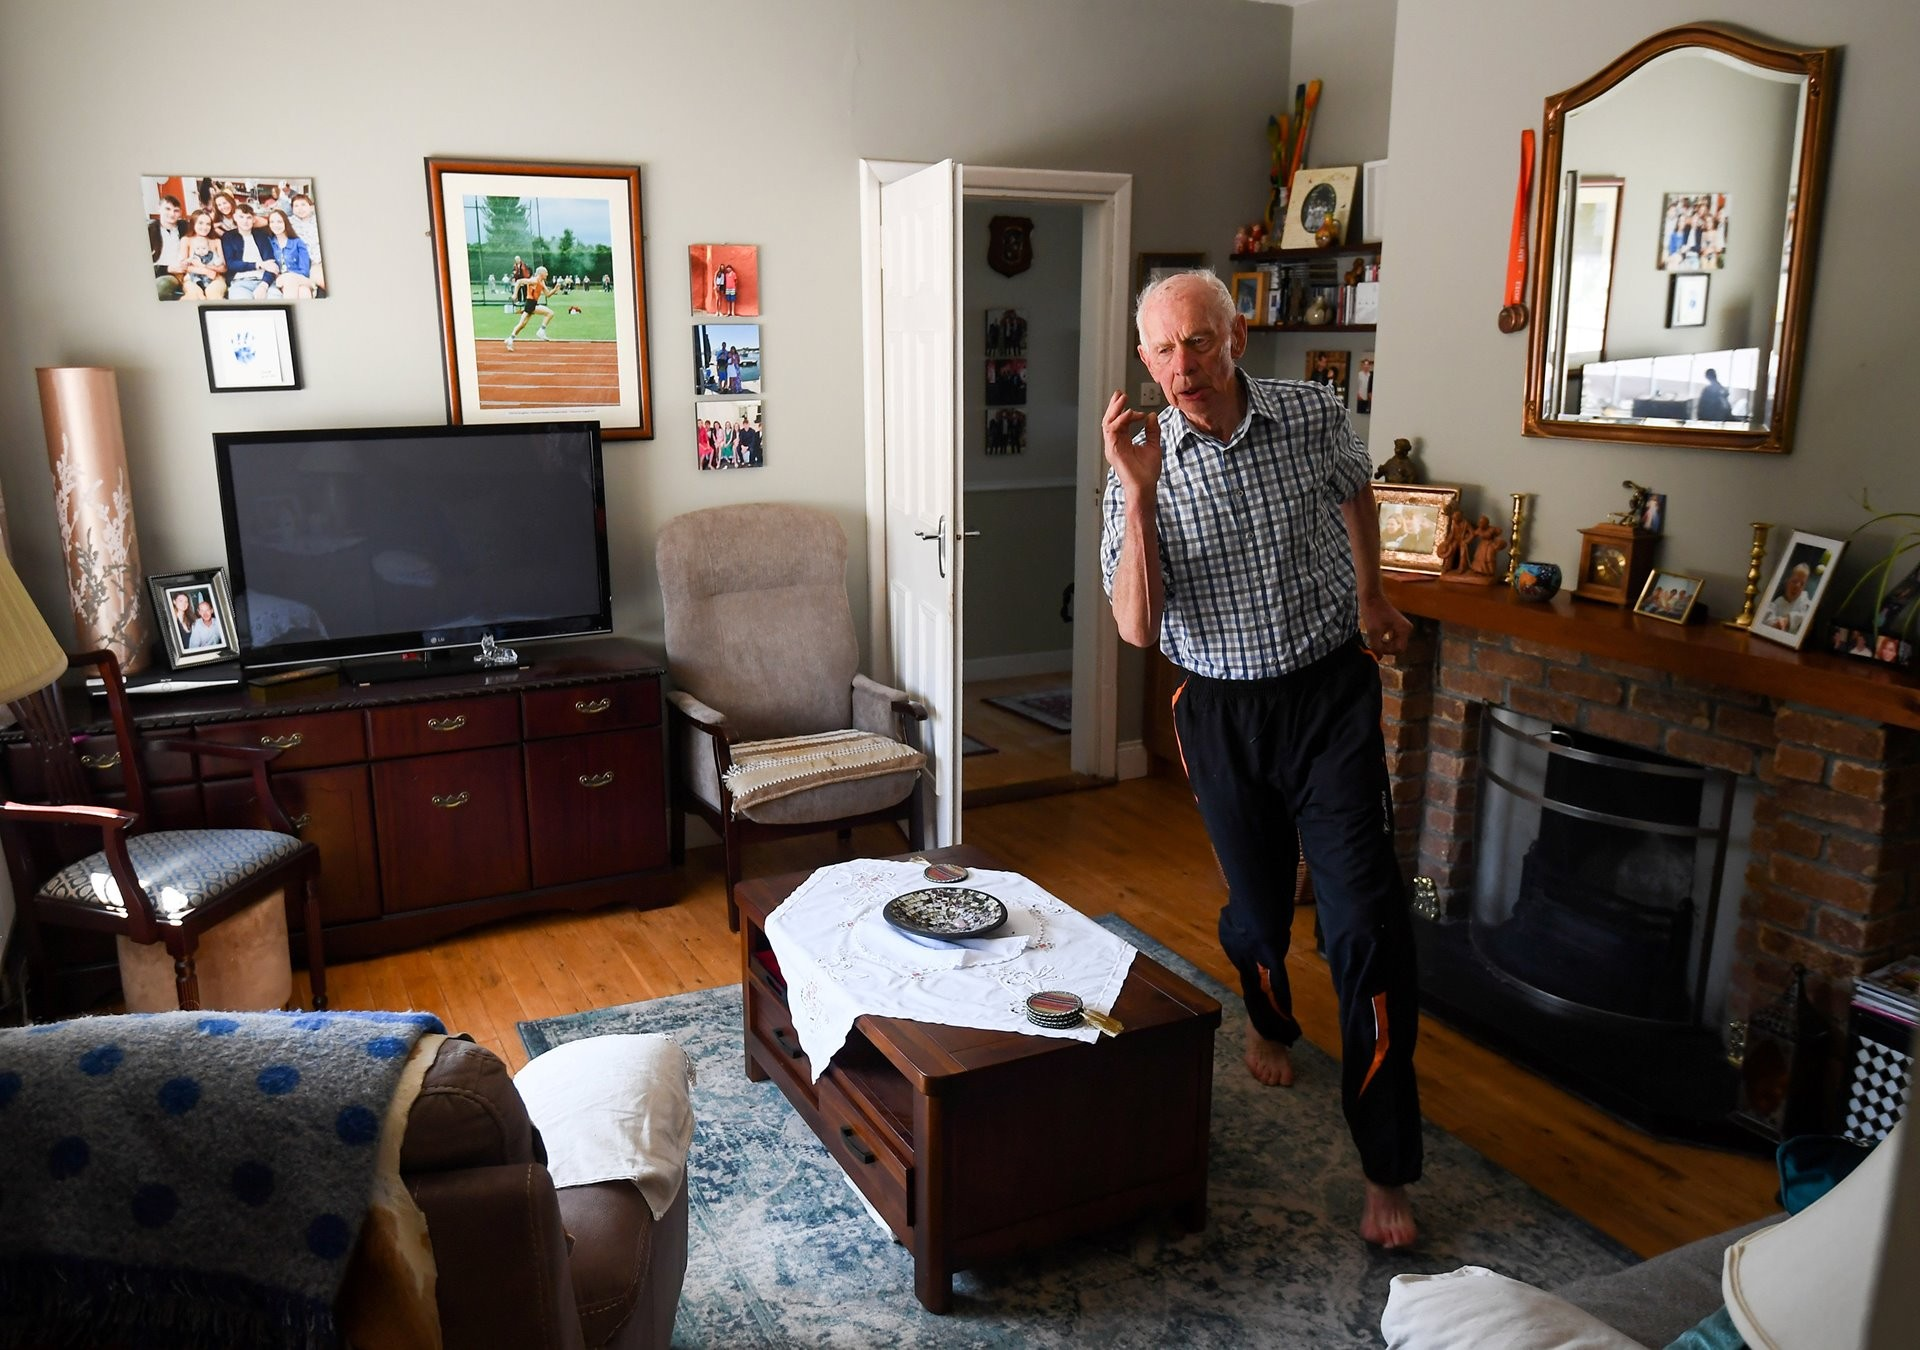 2 место в категории «Спорт», 2021. Спортсмен Пэт Нотон (87 лет) тренируется в своём доме во время карантина. Графство Типперэри, Ирландия, 4 мая 2020 года. Автор Стивен МакКарти